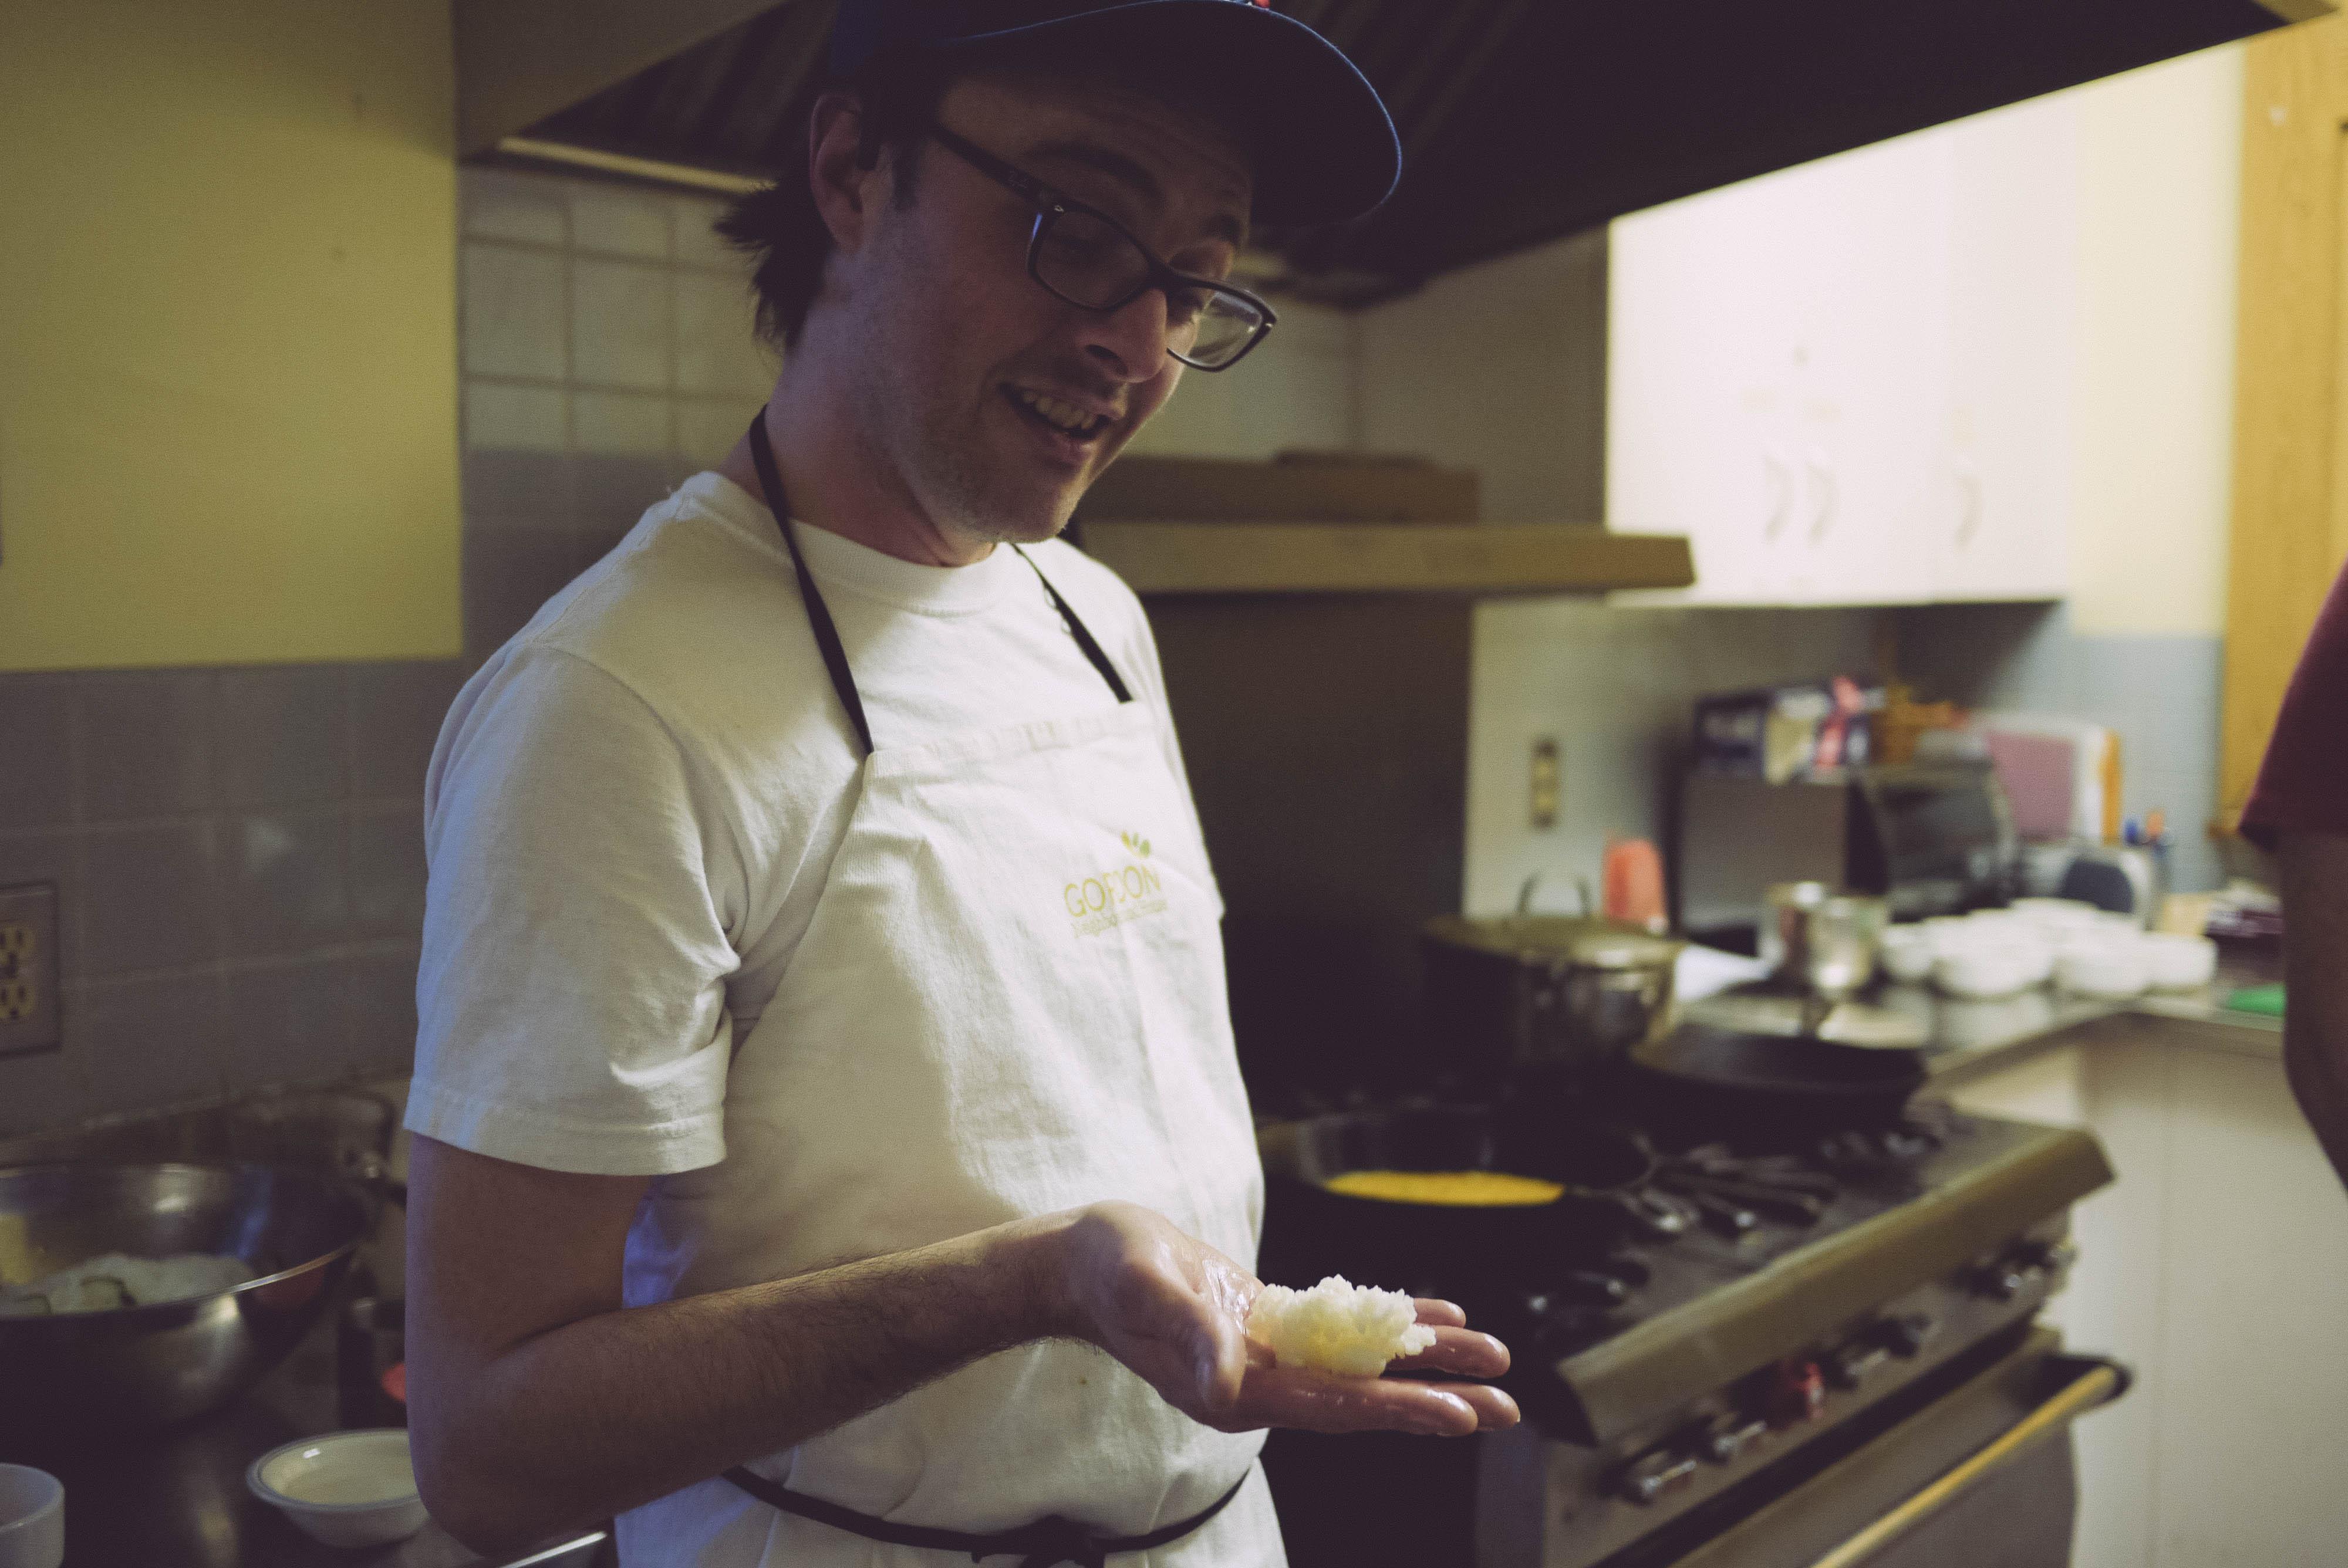 building a community around food - 2